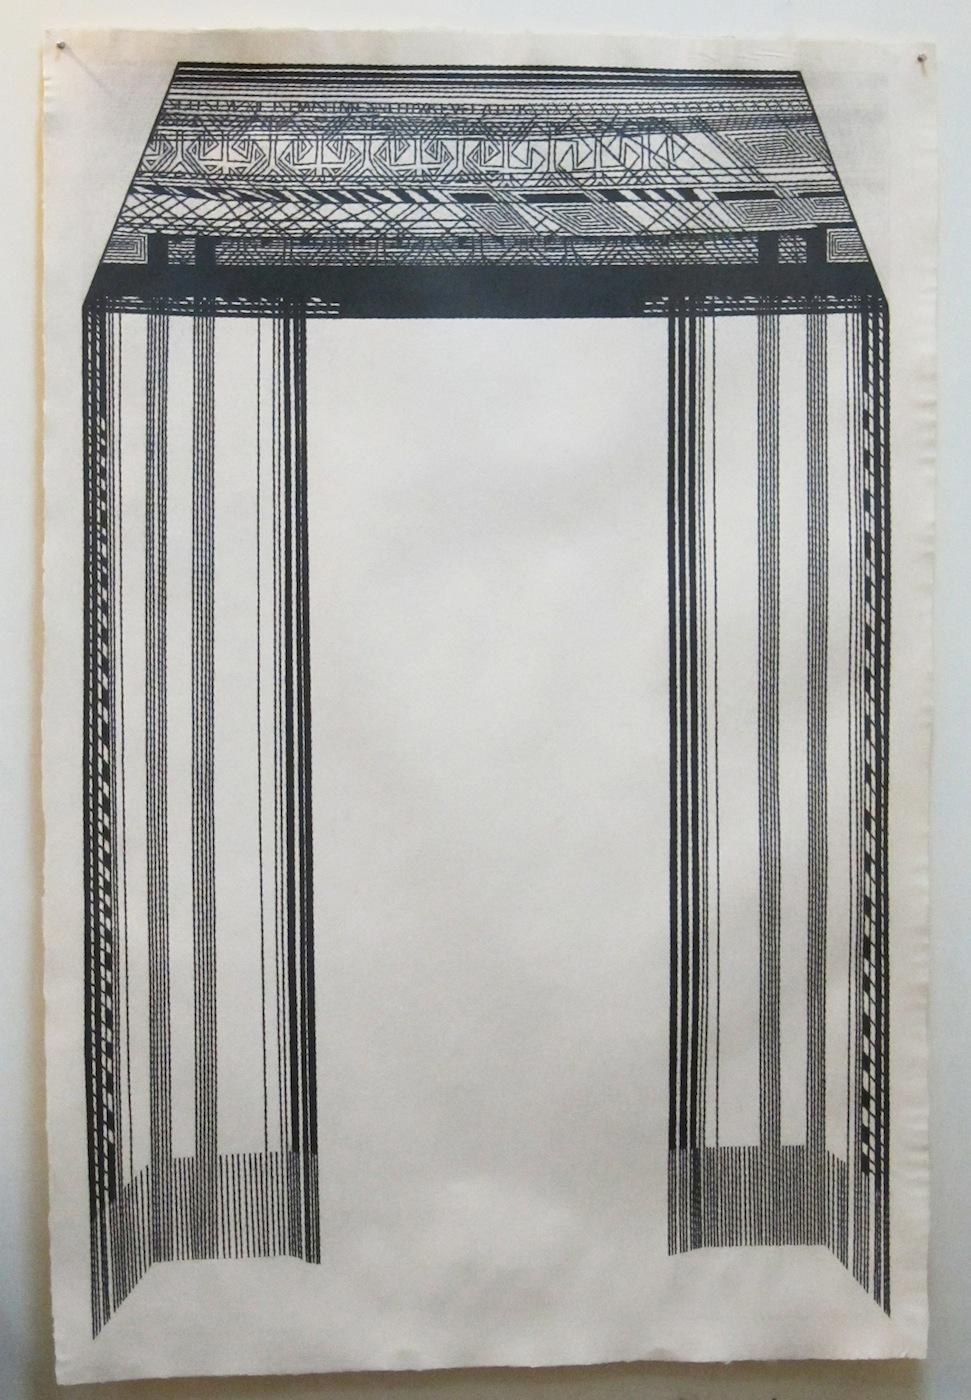 Alyssa Pheobus Mumtaz  Honour 2010 Graphite on handmade paper 152.4 x 101.6 cm